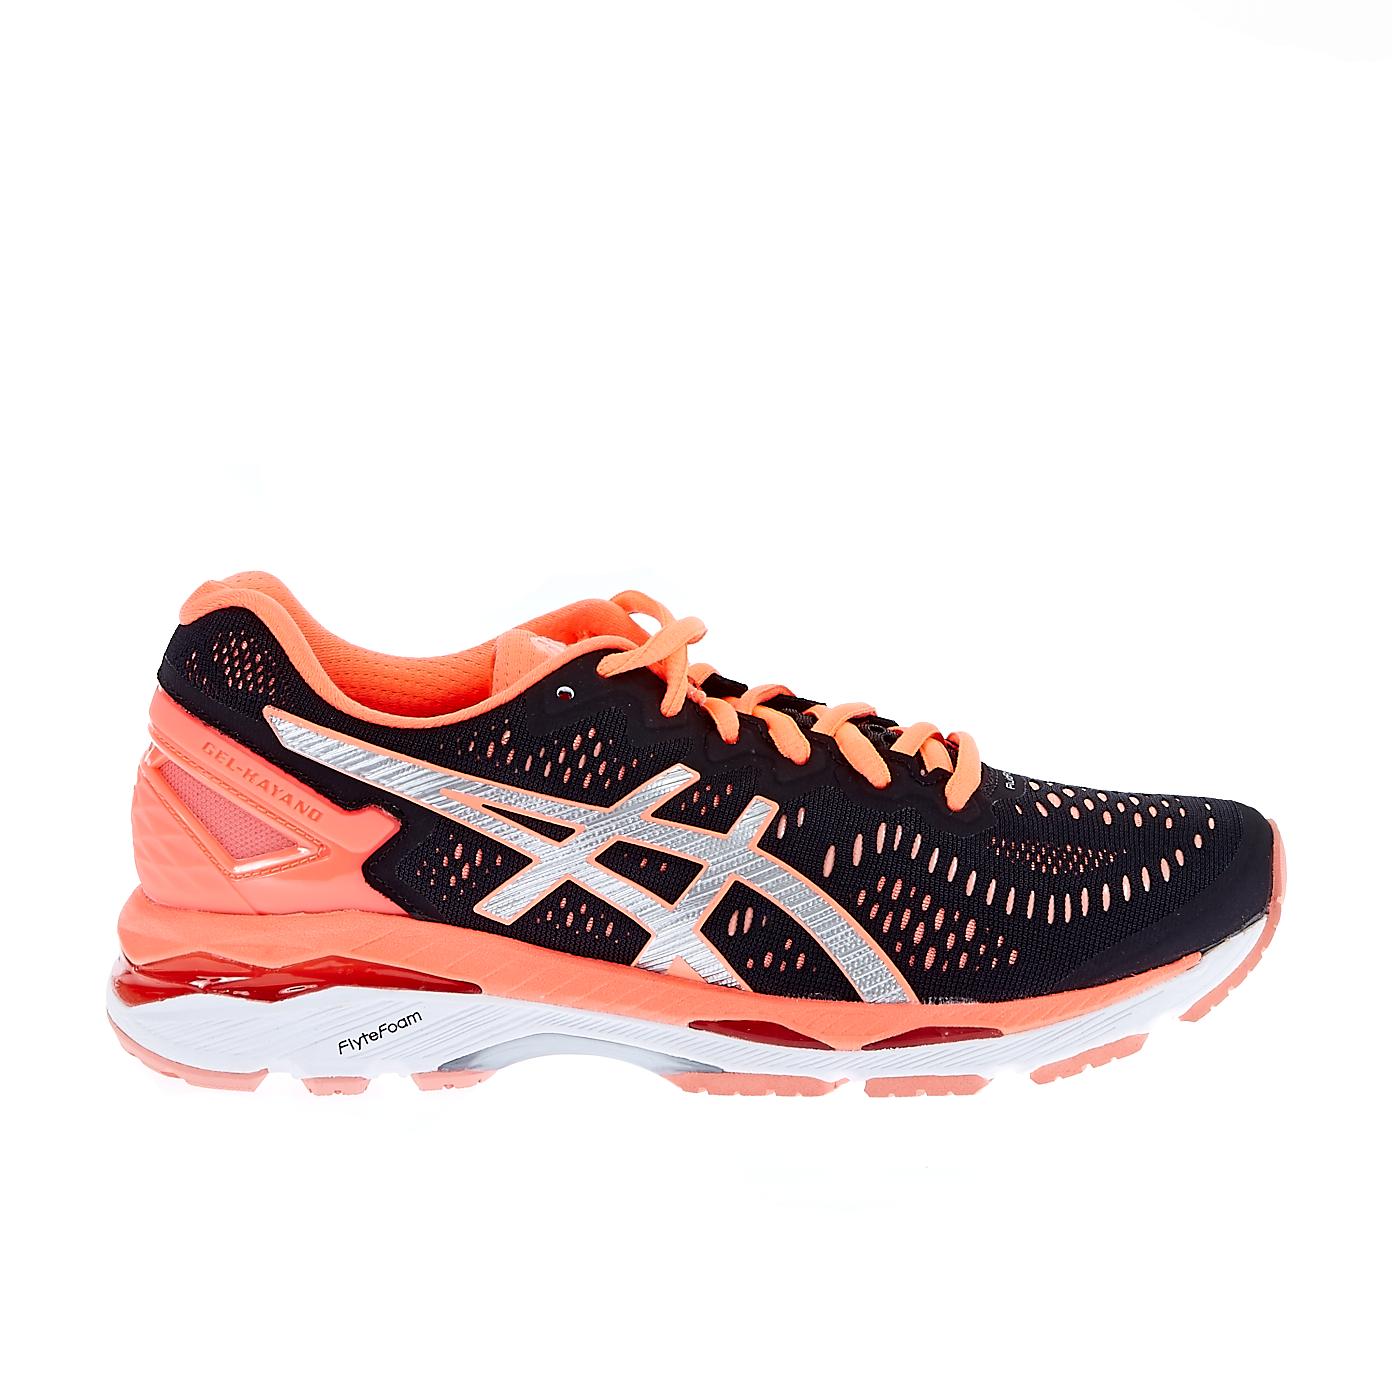 ASICS - Γυναικεία παπούτσια Asics GEL-KAYANO 23 μαύρο-κοραλί γυναικεία παπούτσια αθλητικά running